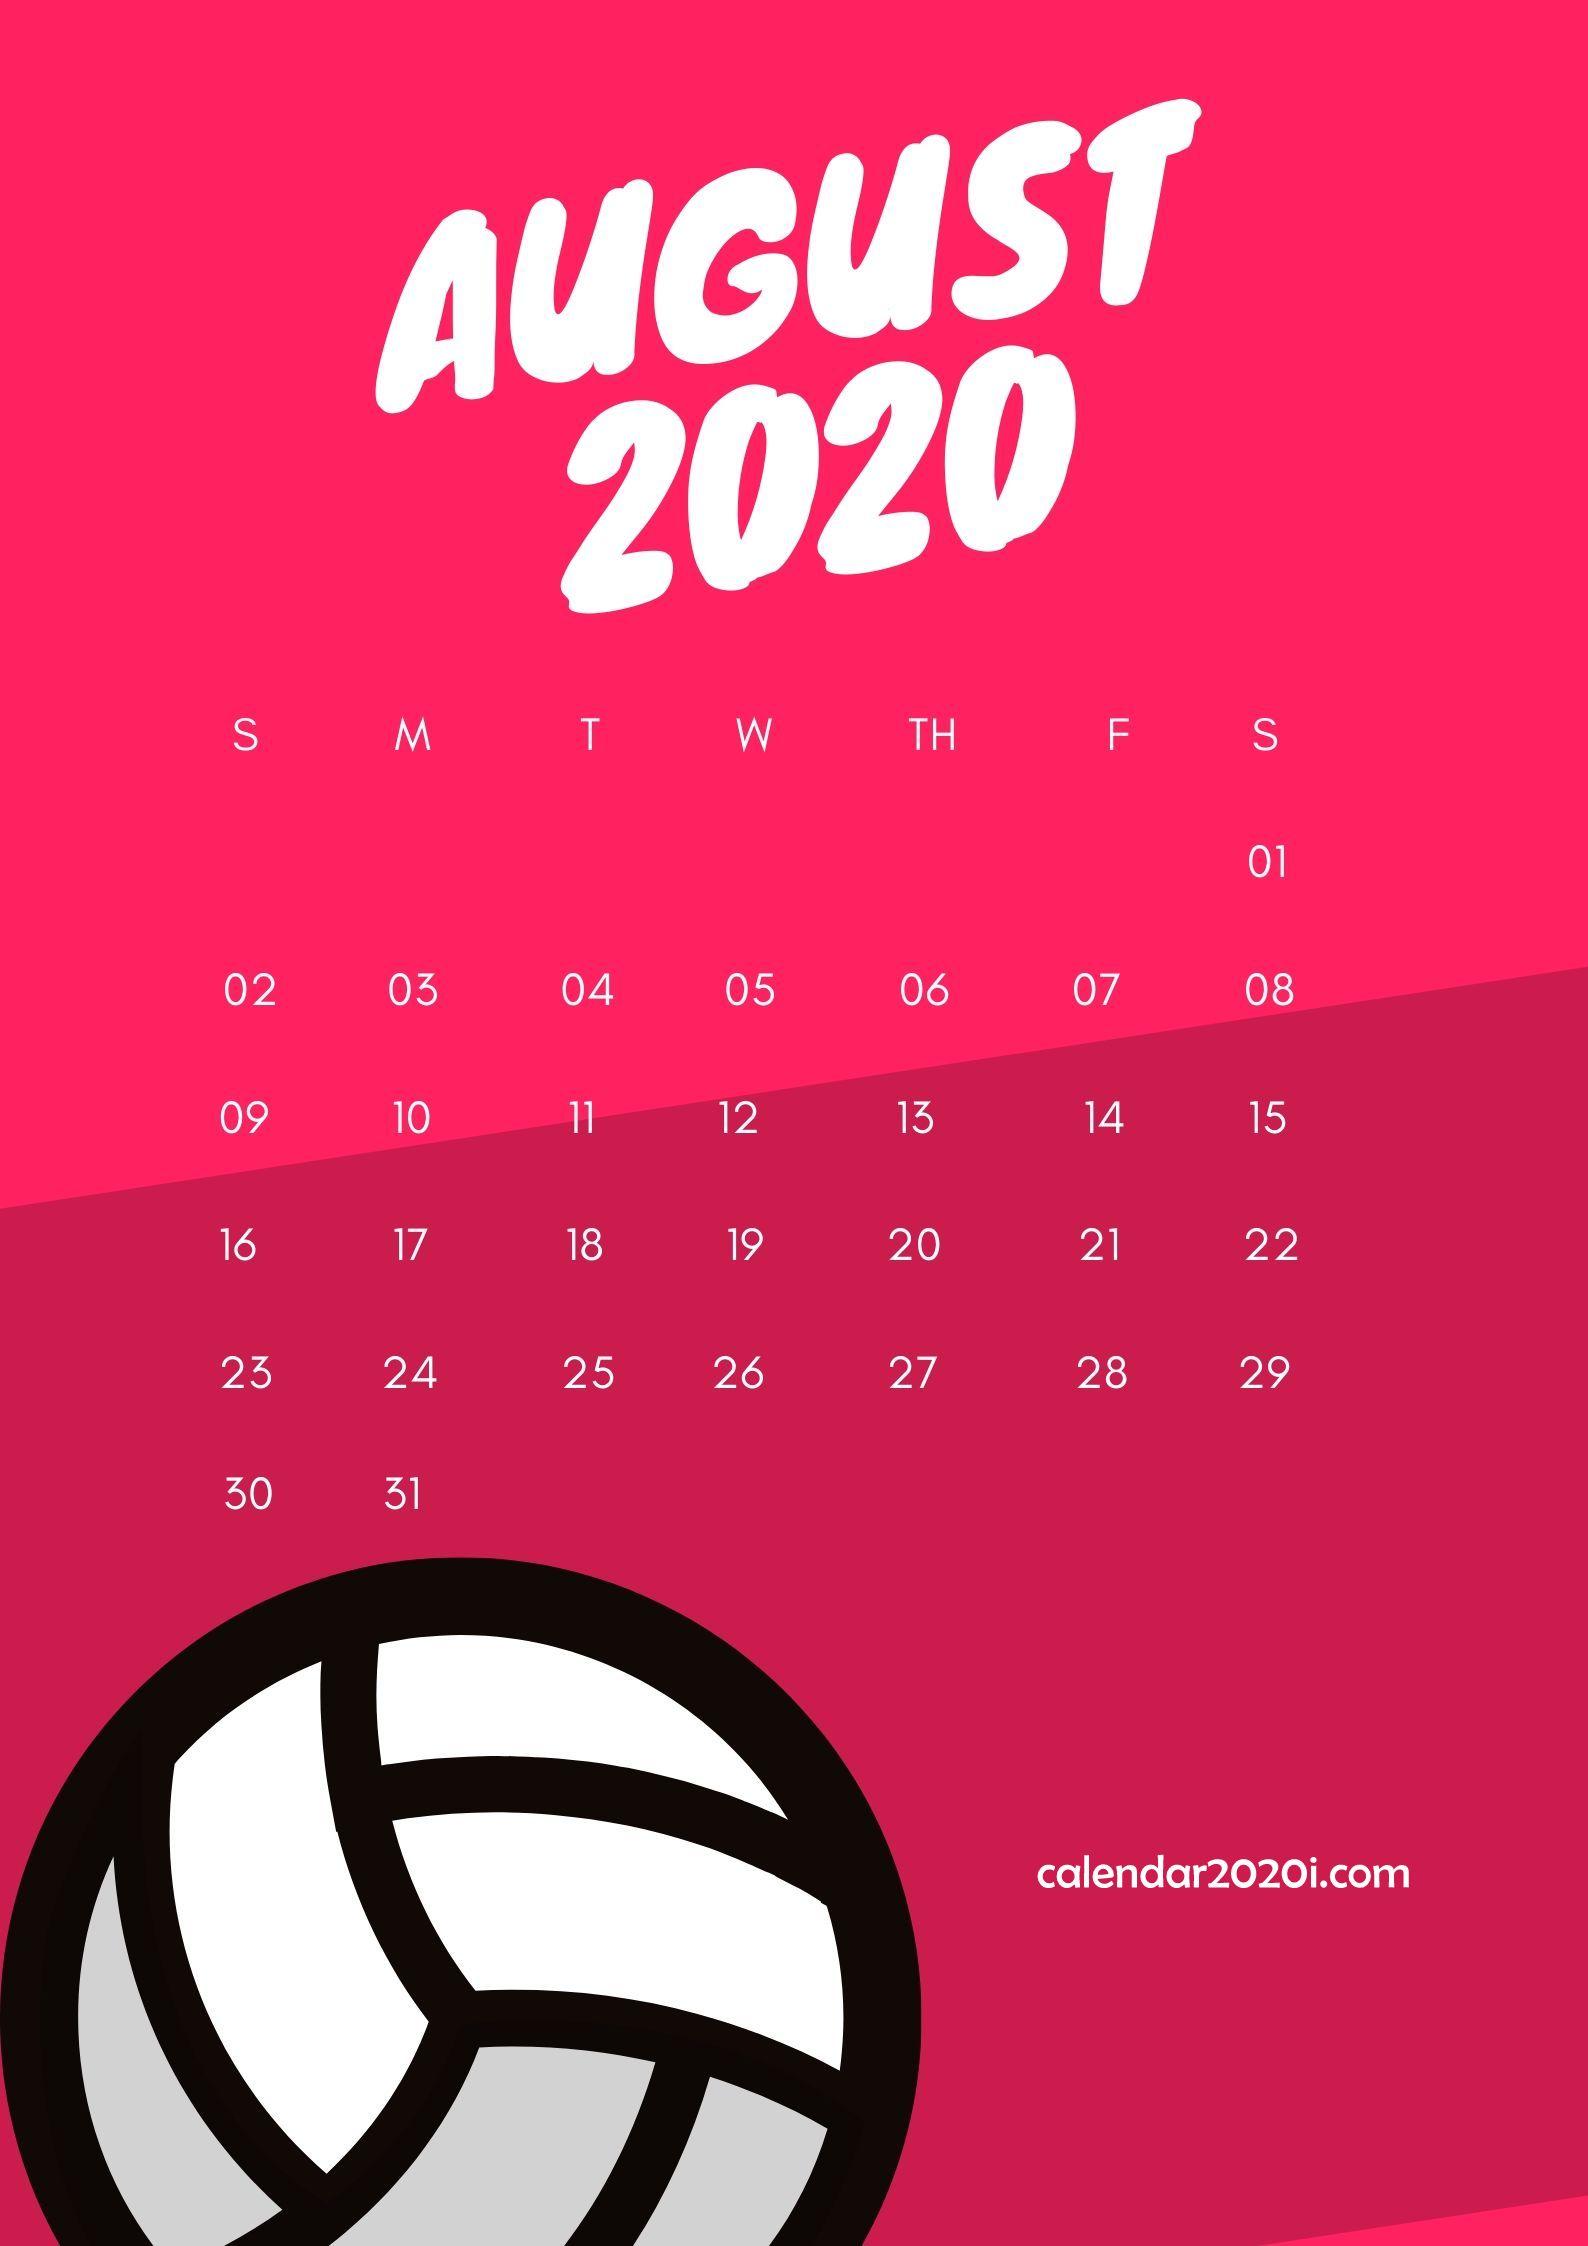 August 2020 Wall Calendar Printable